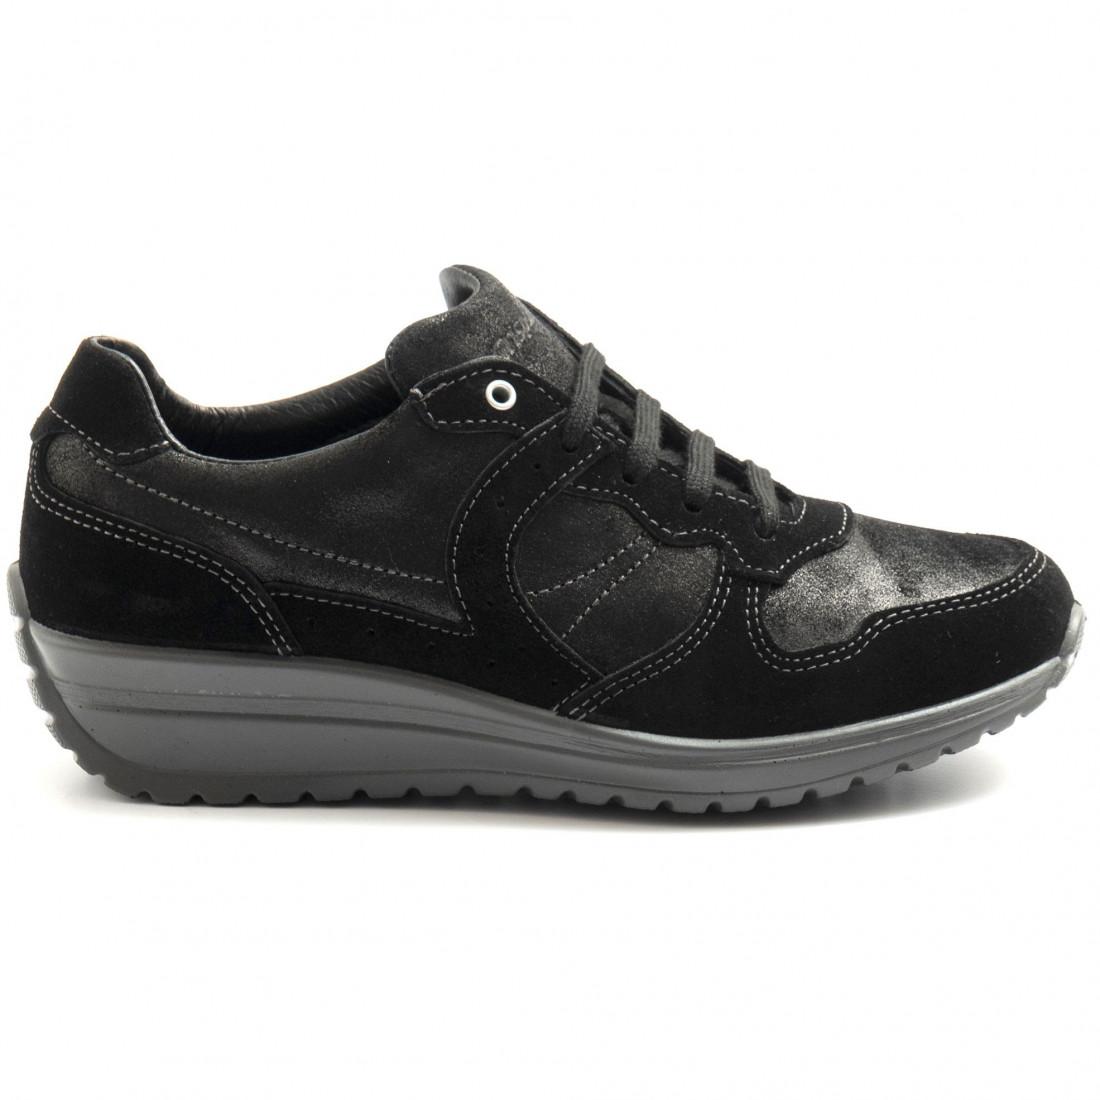 sneakers woman grisport 5712var 58 8035